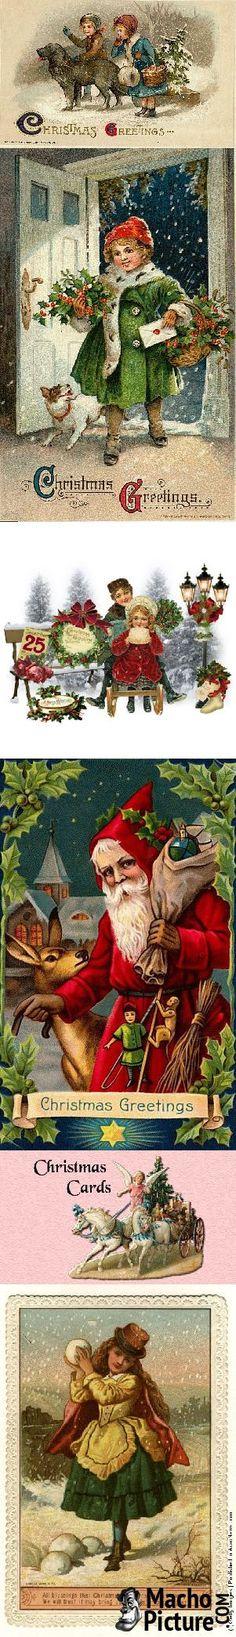 Victorian christmas greetings - 7 PHOTO!